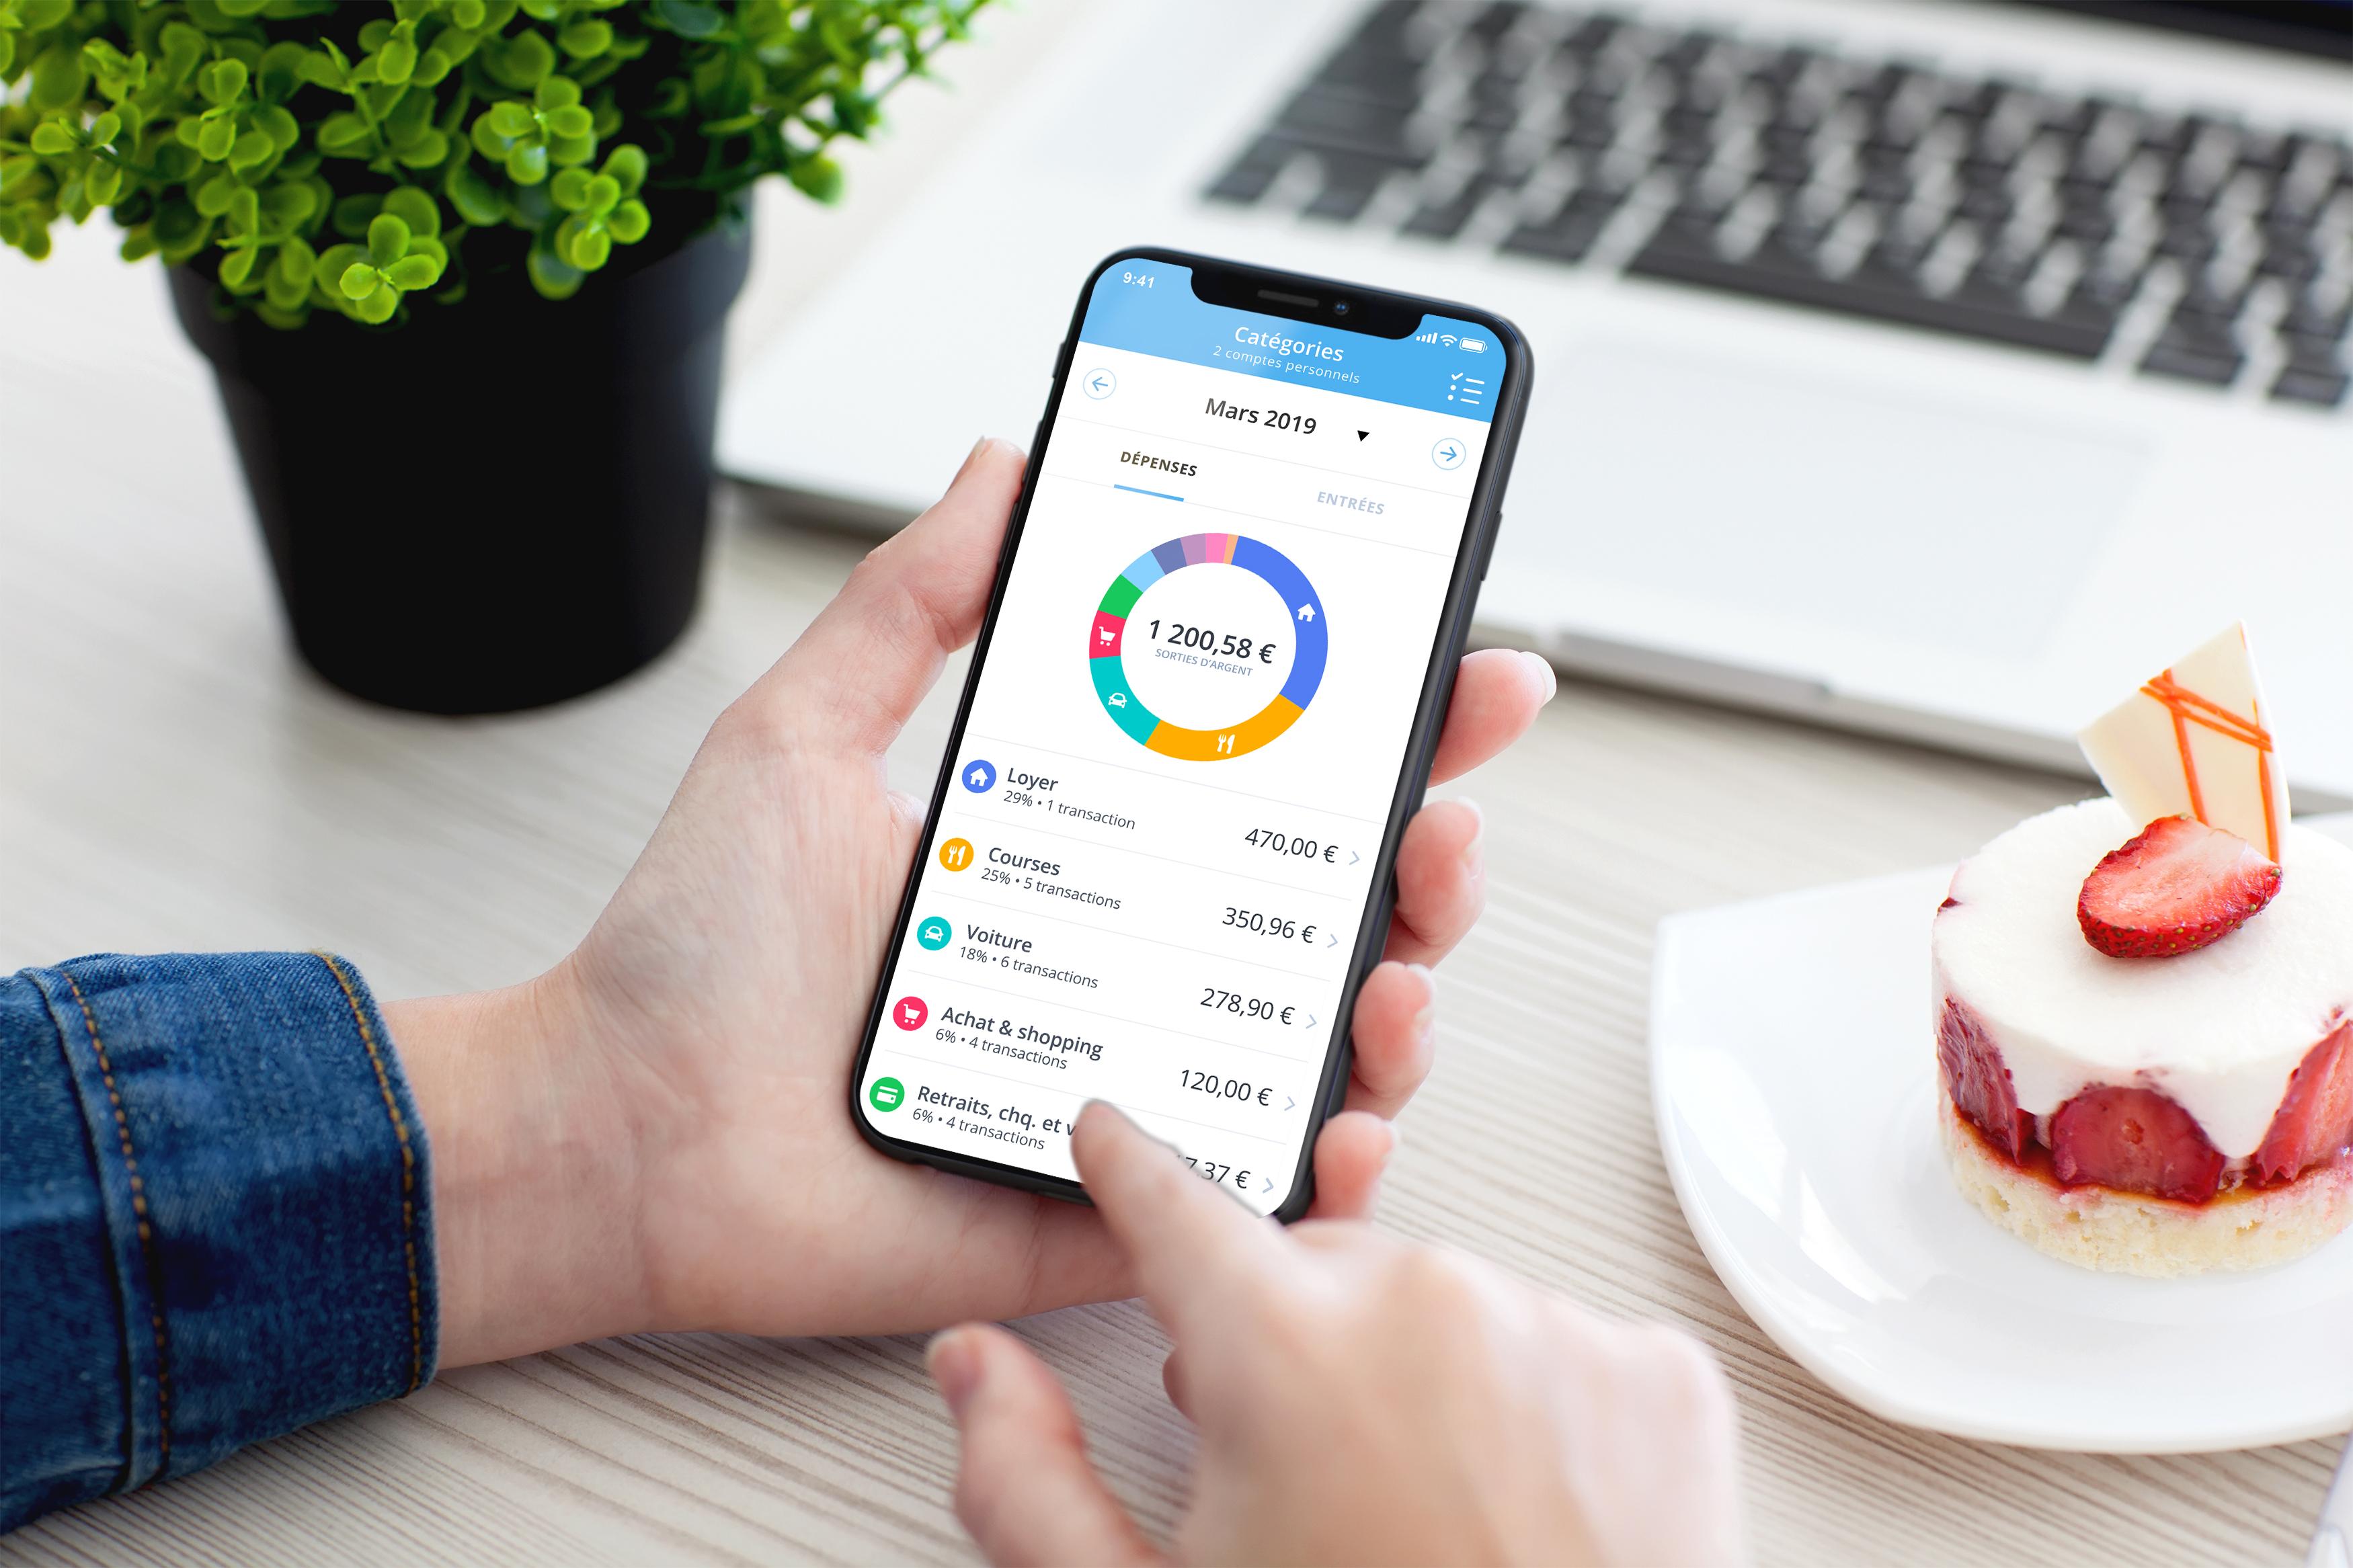 techcrunch.com - Romain Dillet - Bankin' raises $22.6 million for its financial coach